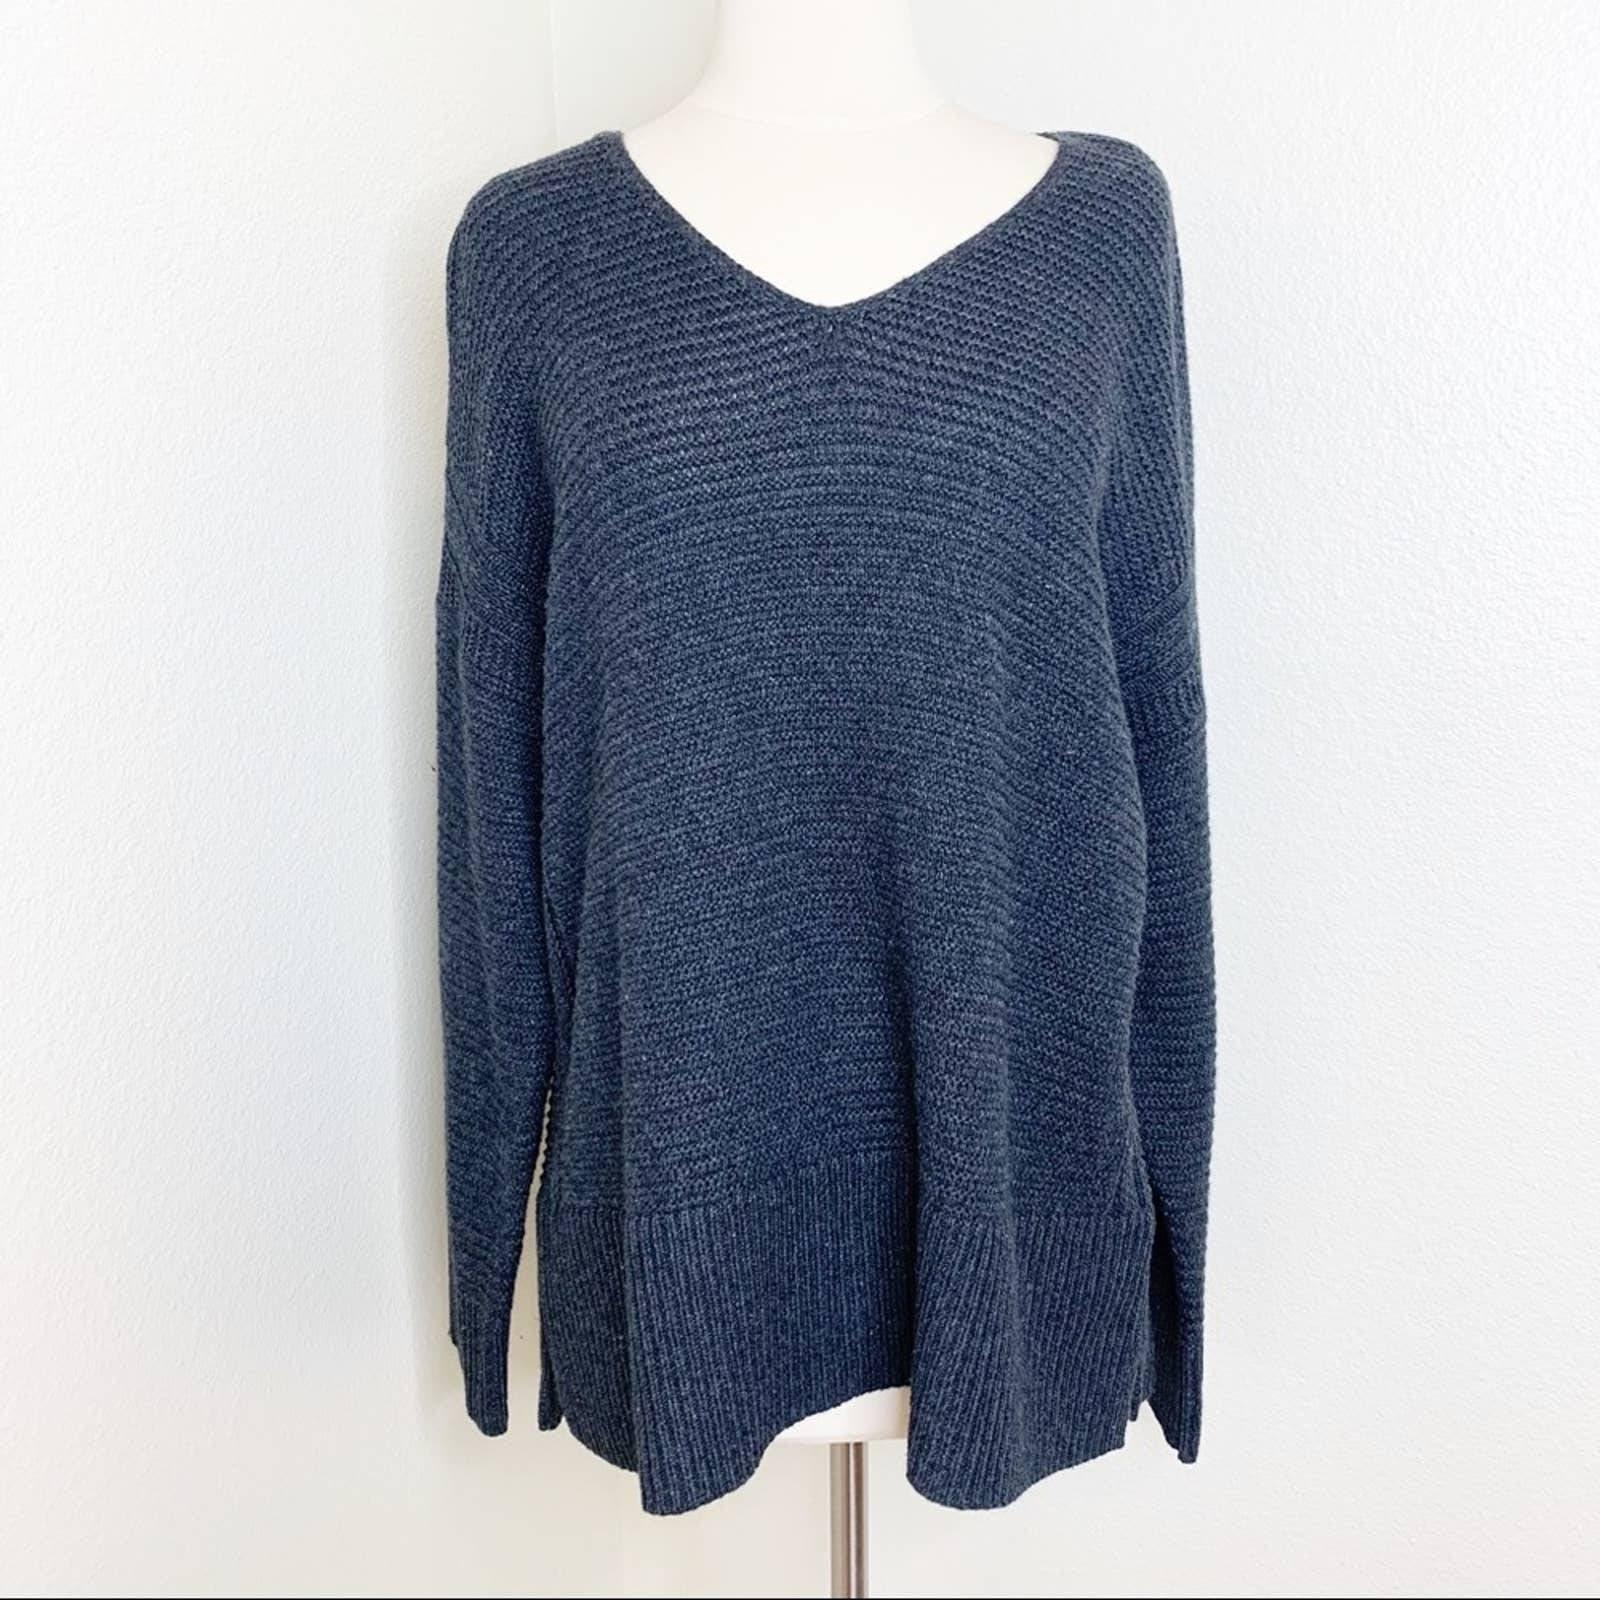 J Jill Charcoal Gray Ribbed Sweater